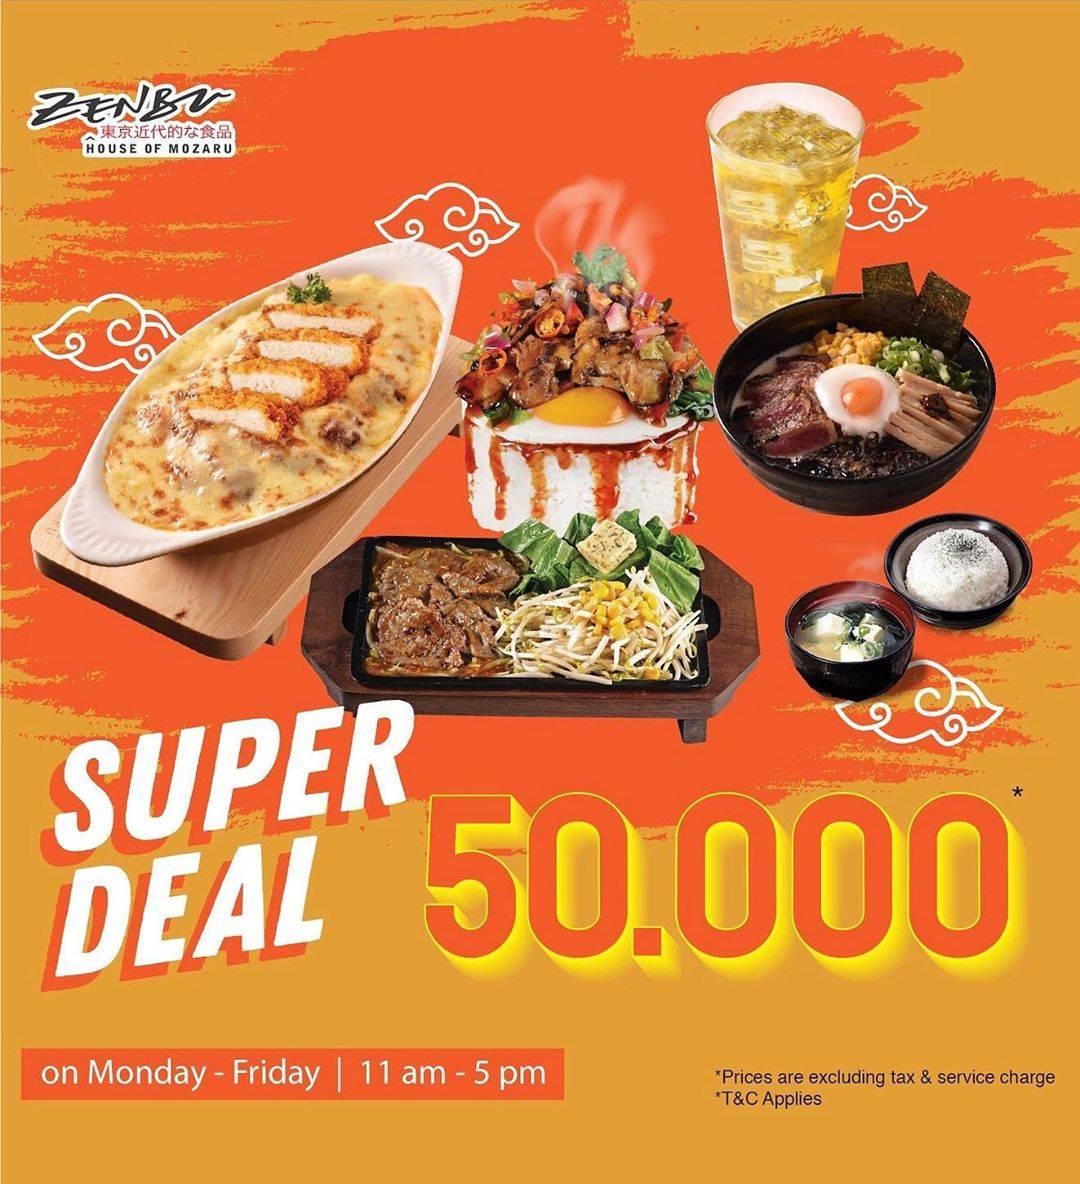 Diskon Promo Zenbu Harga Spesial Paket Super Deal Hanya Rp. 50.000